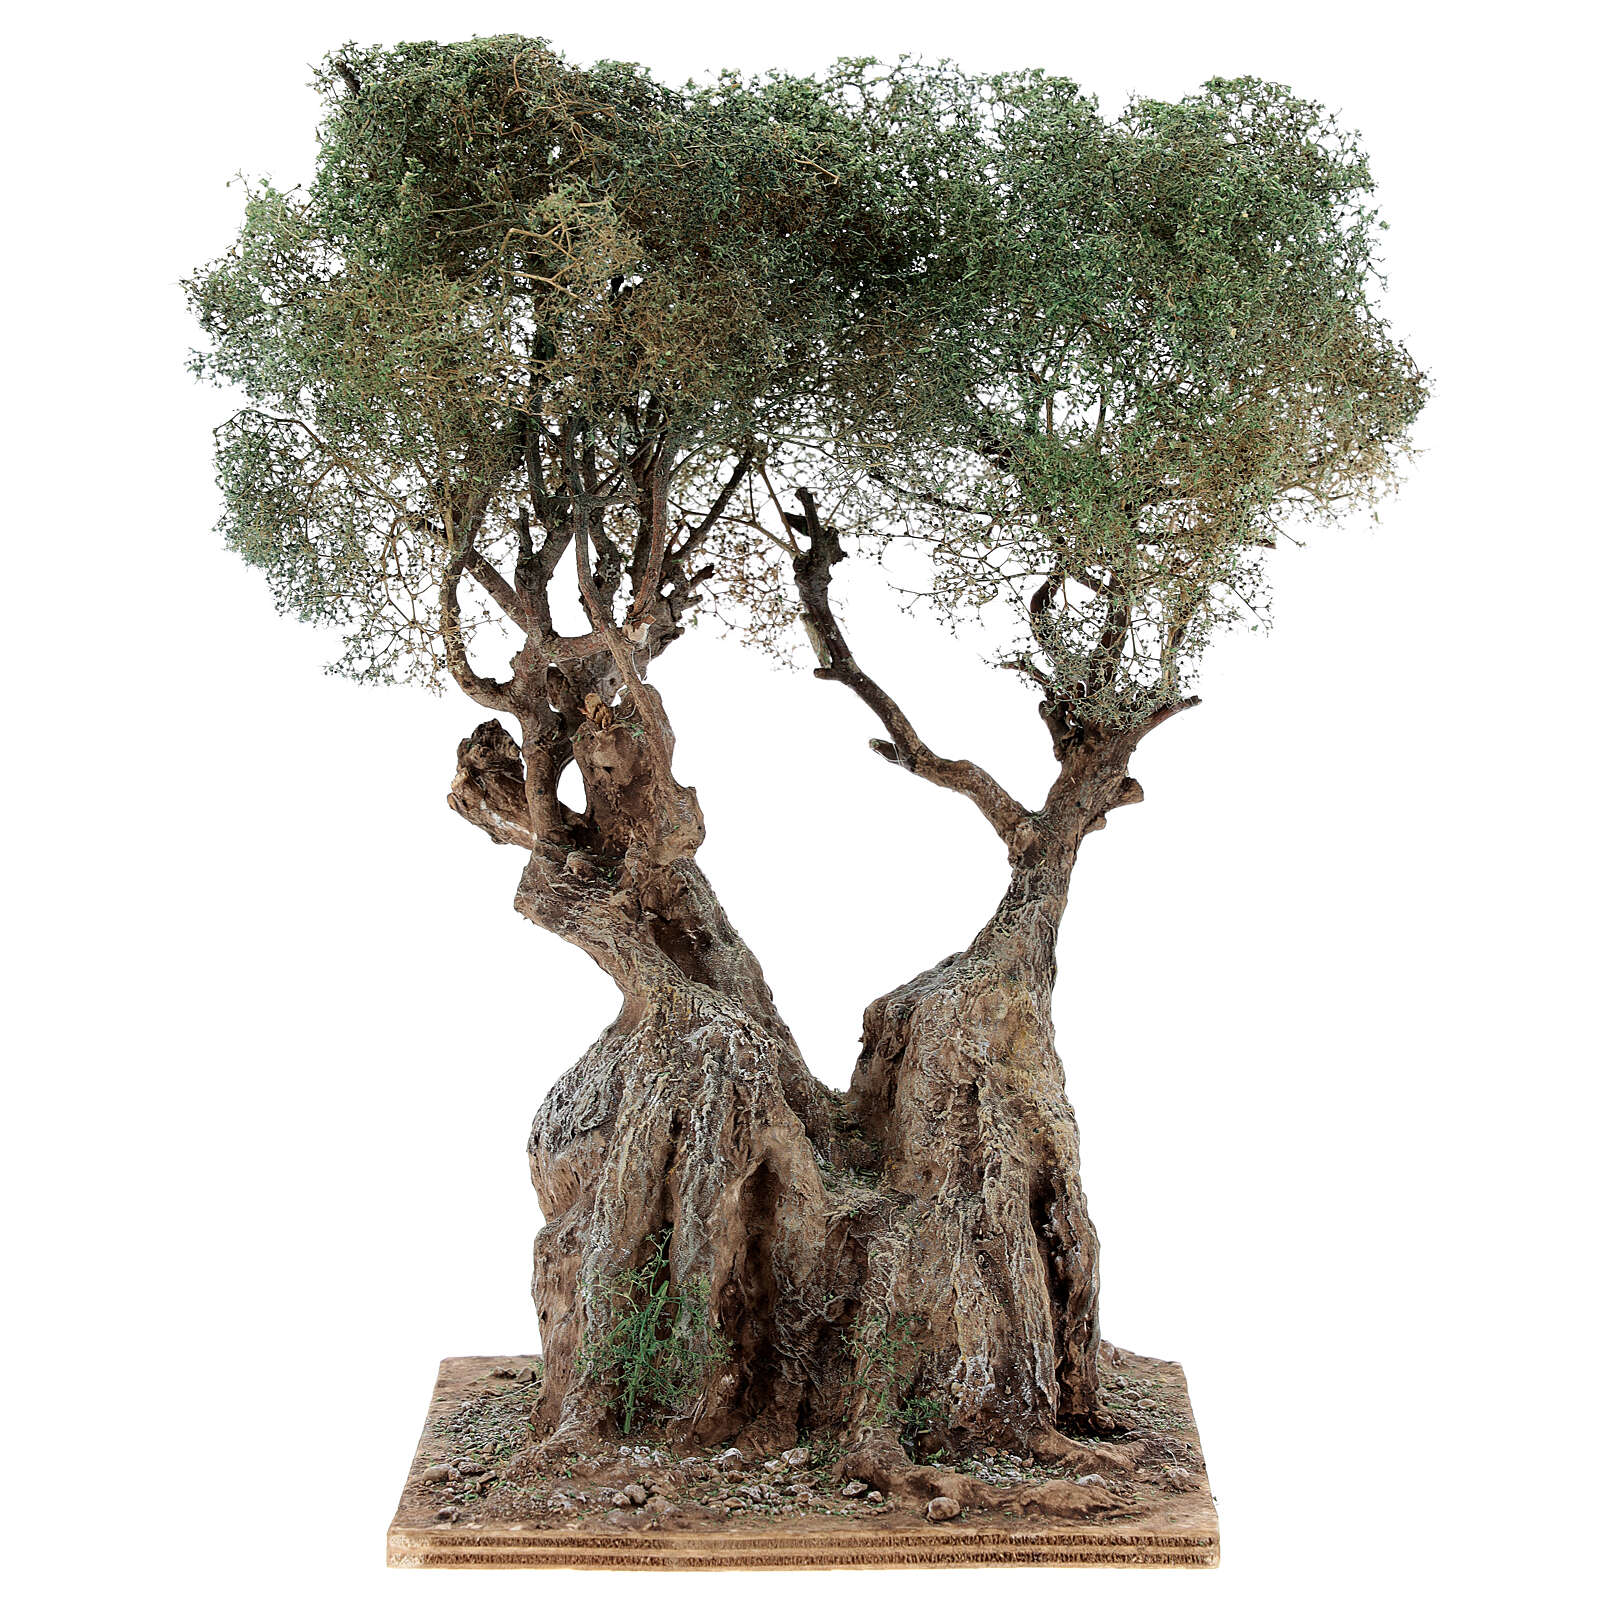 Realistic olive tree for Neapolitan Nativity scene real wood papier-mache h 20 cm 4